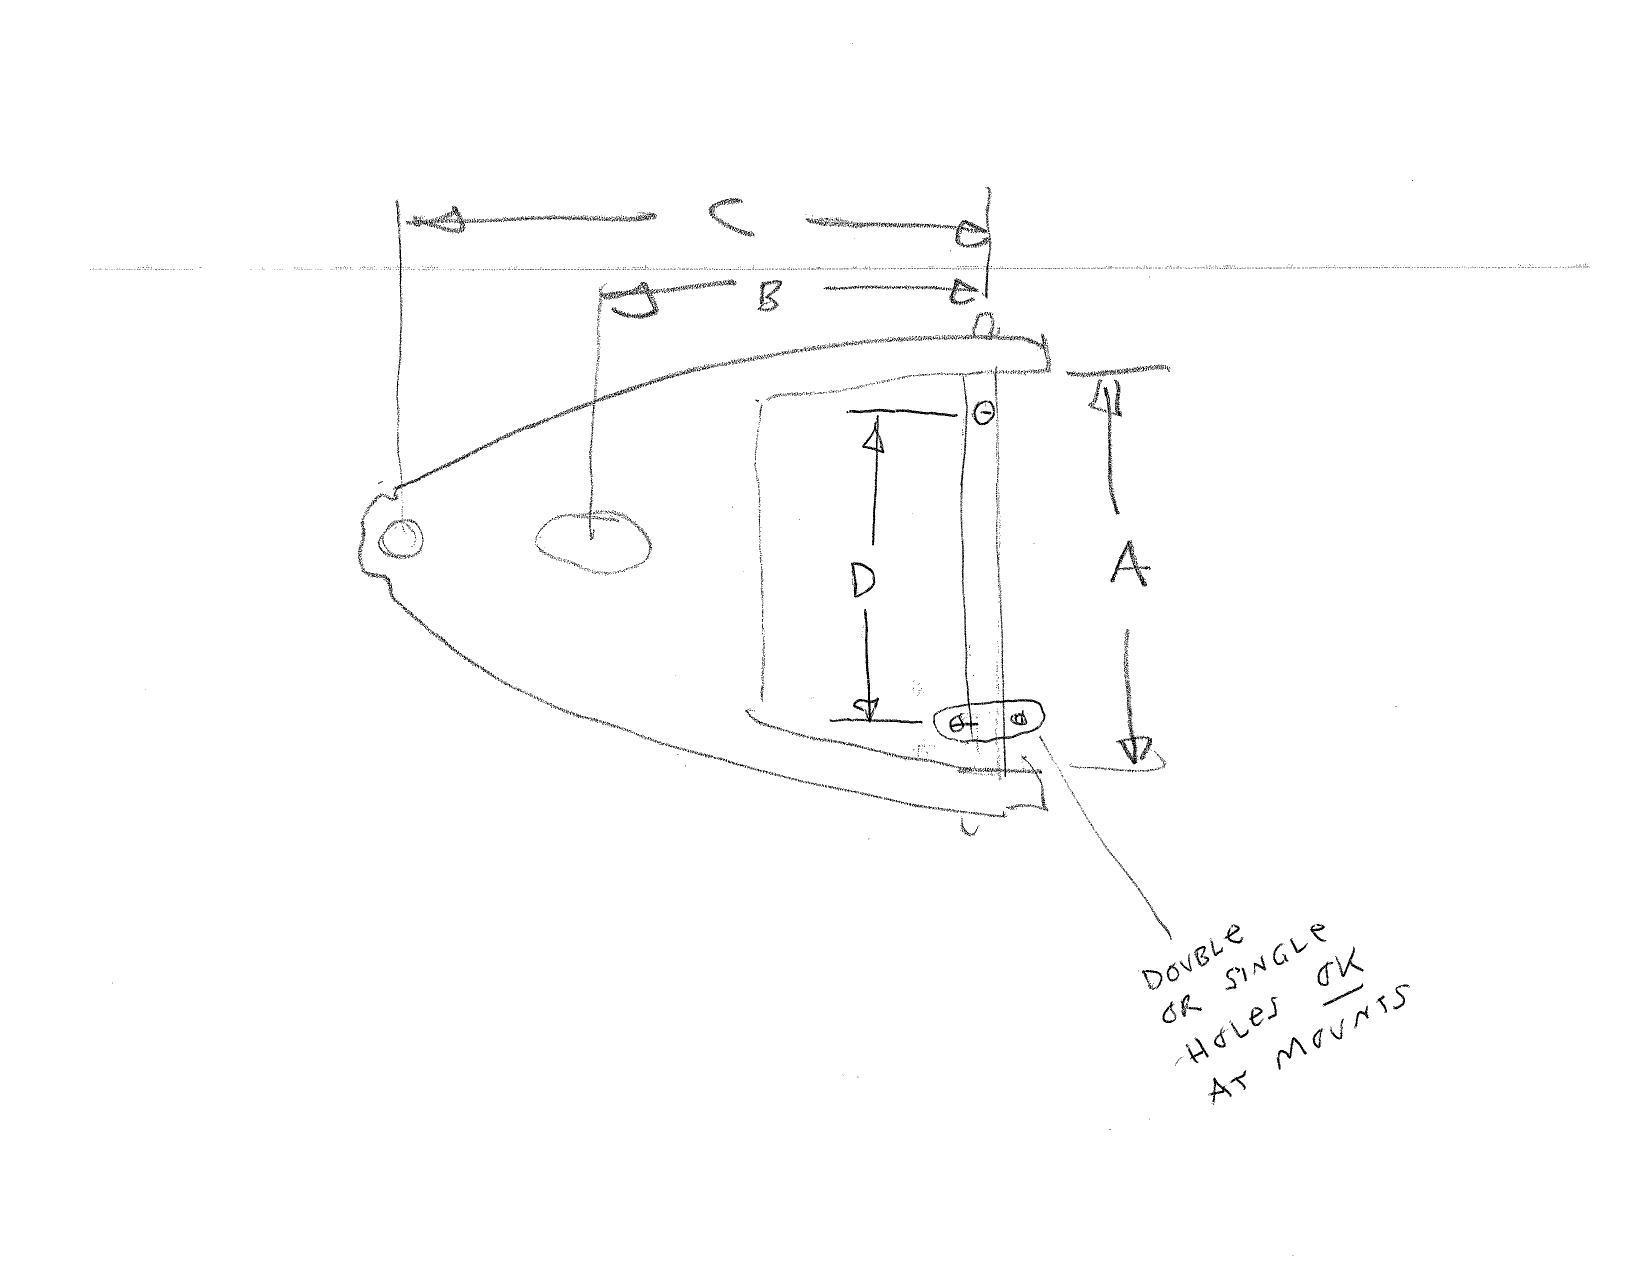 Click image for larger version  Name:Arm Sketch Rev2_1.jpg Views:683 Size:83.2 KB ID:131009